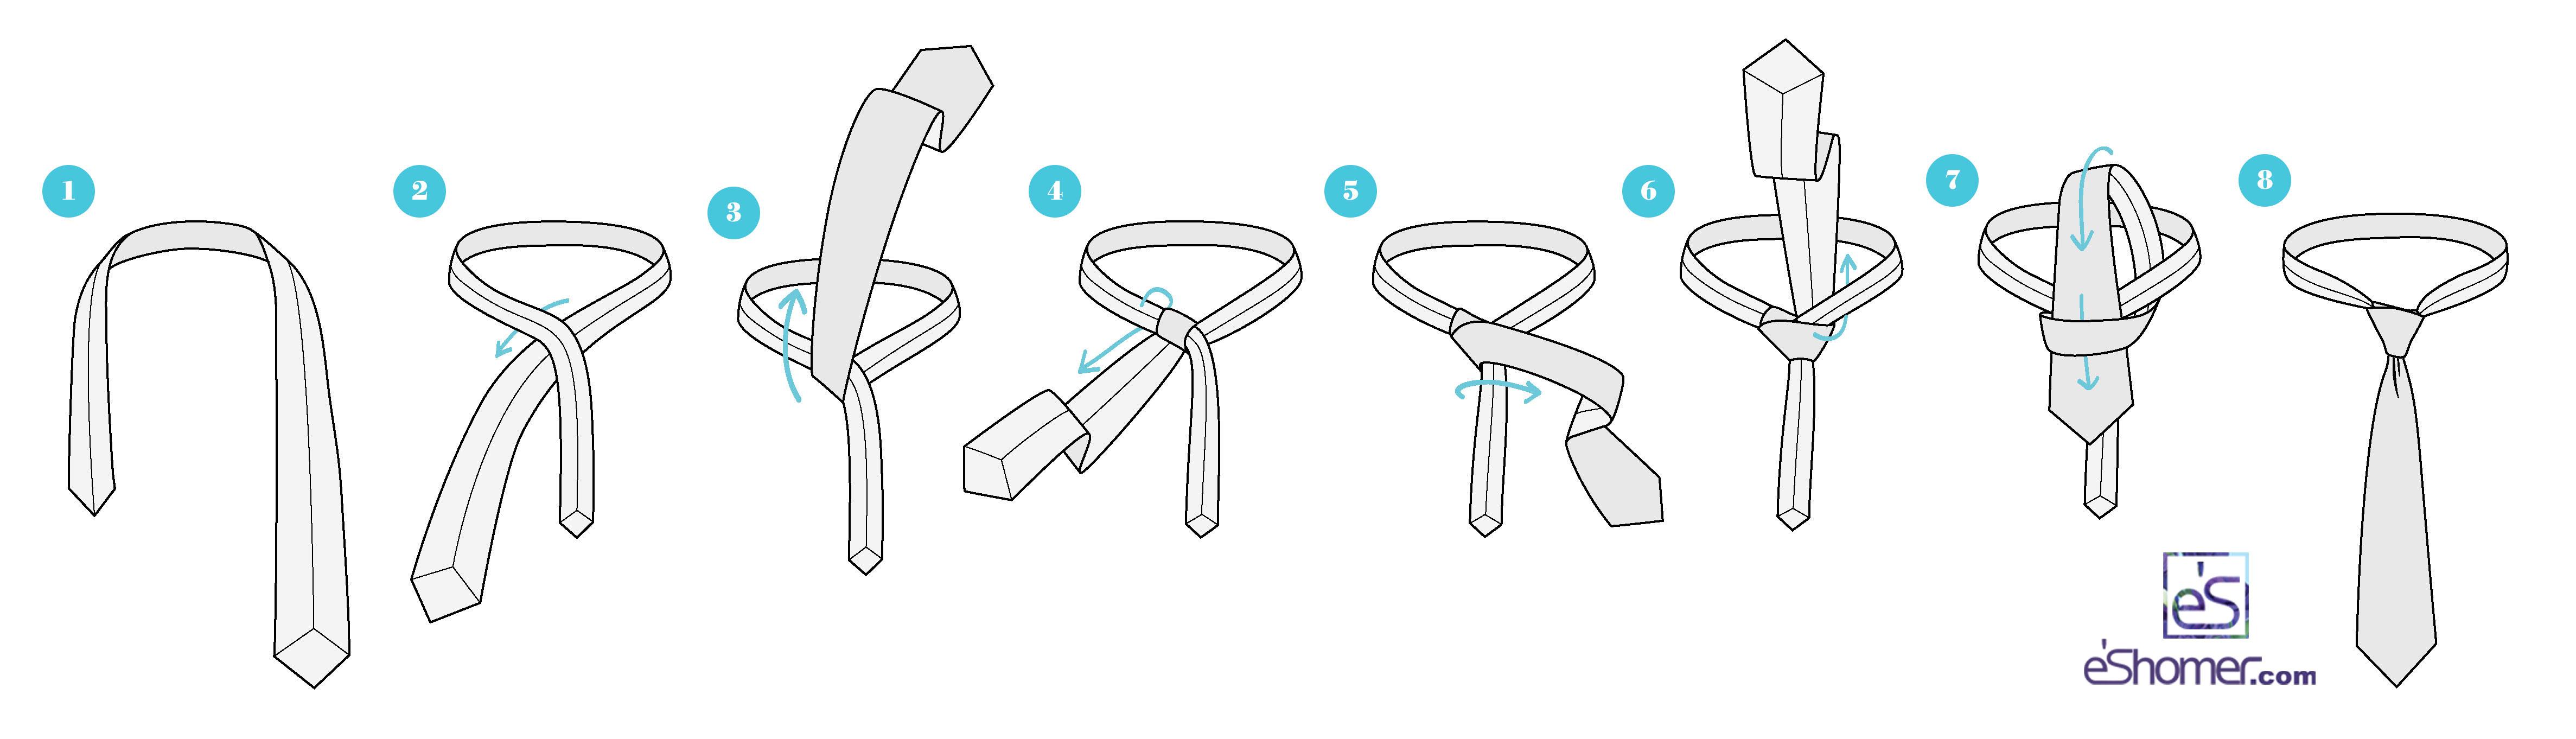 pratt-knot-tie-education